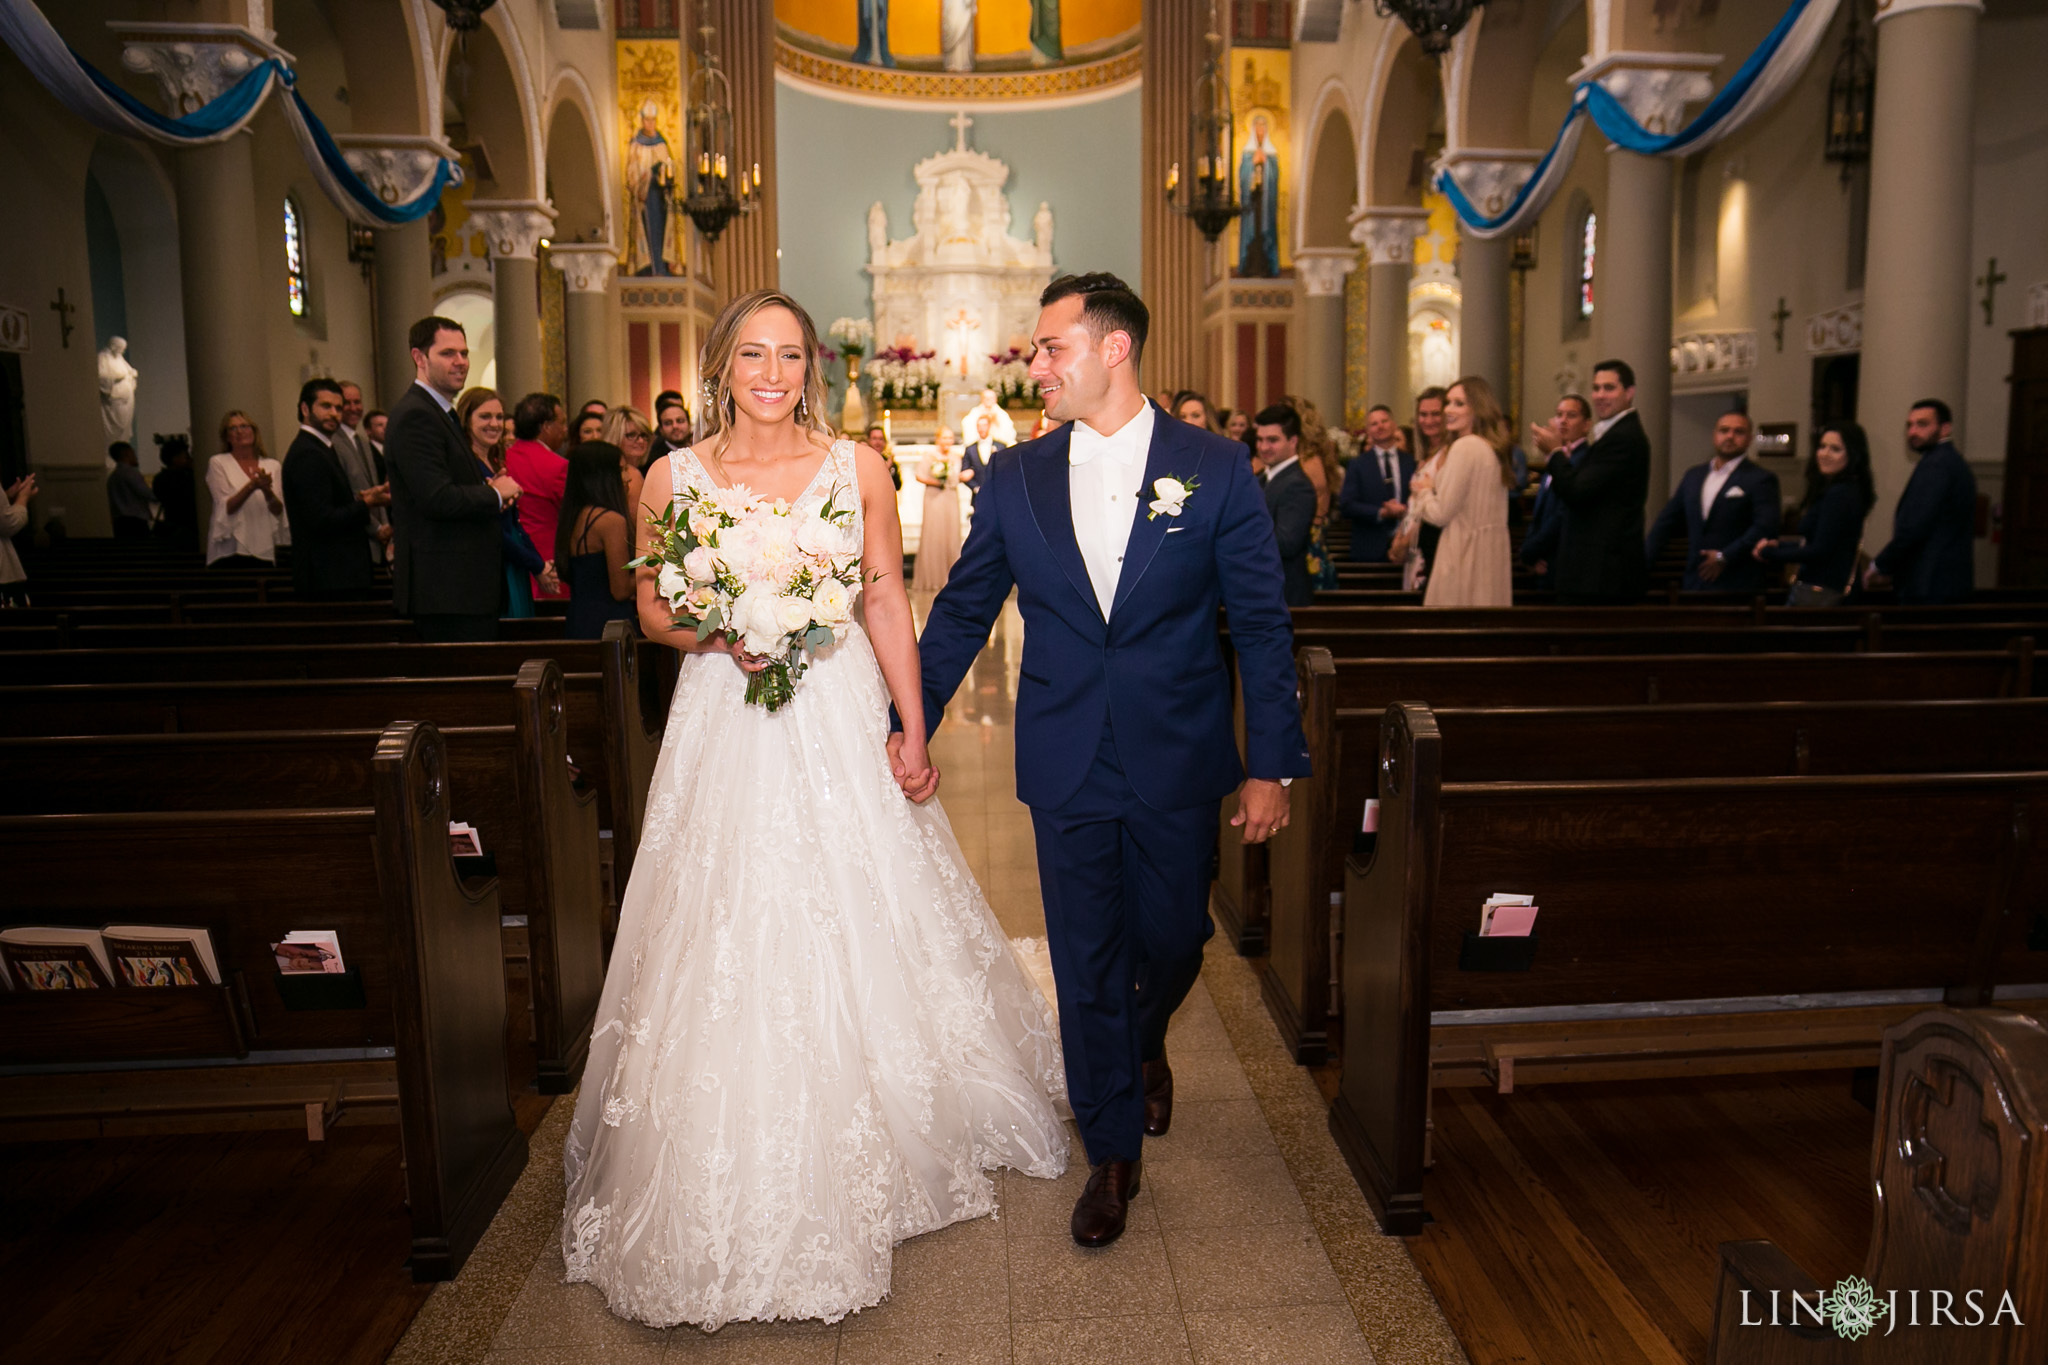 40 stmonica catholic church santa monica wedding ceremony photography